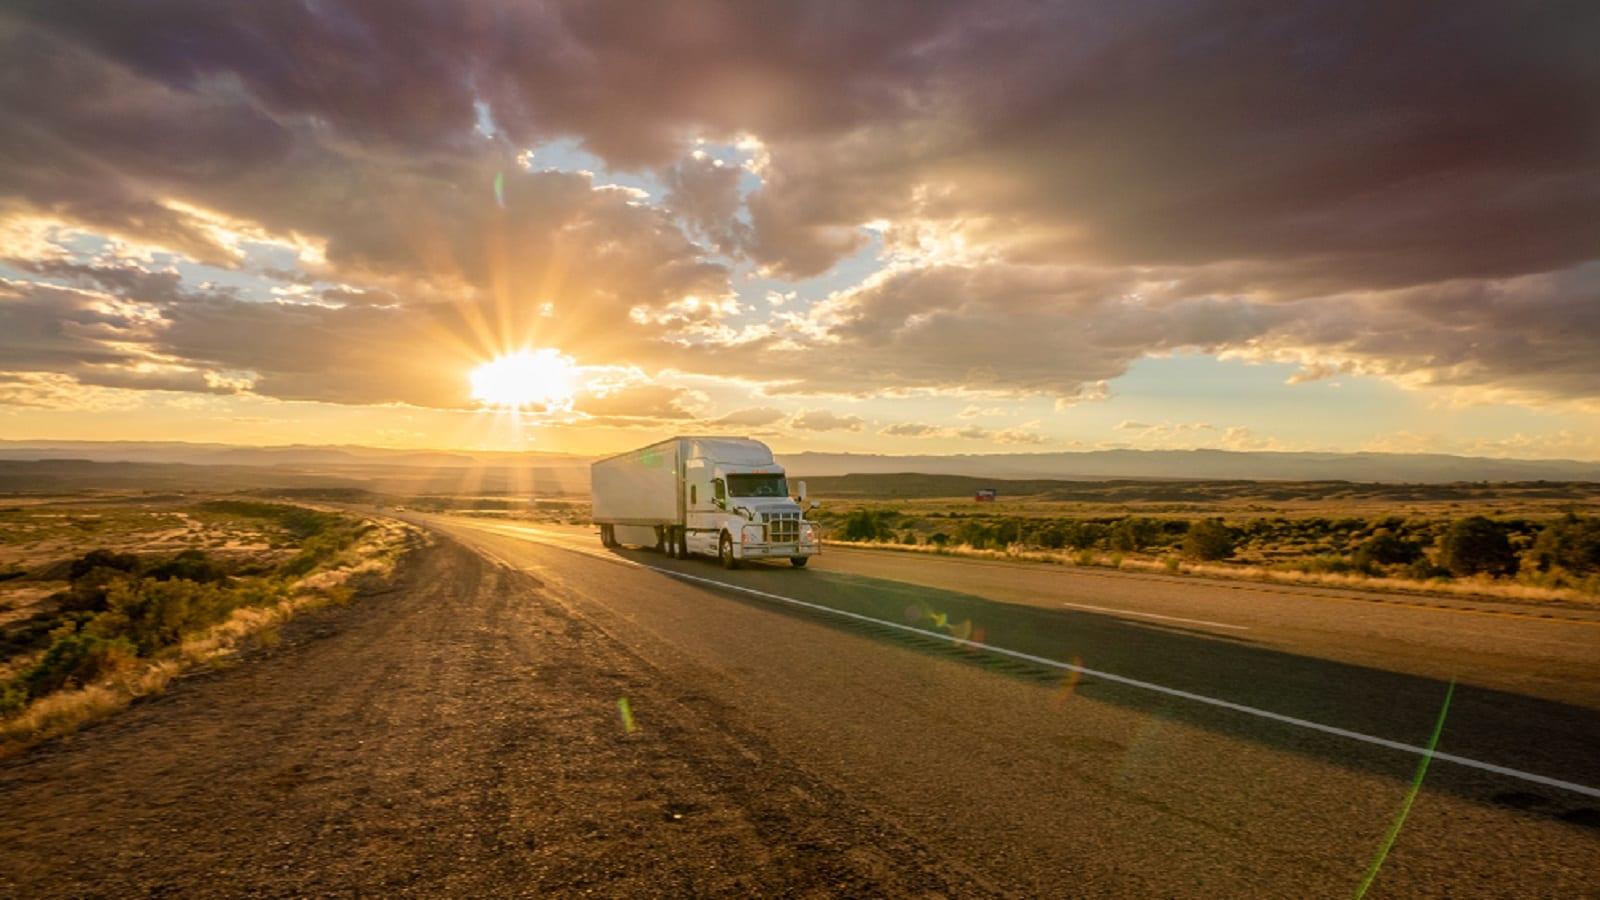 Semi-Truck Driving At Dusk Stock Photo